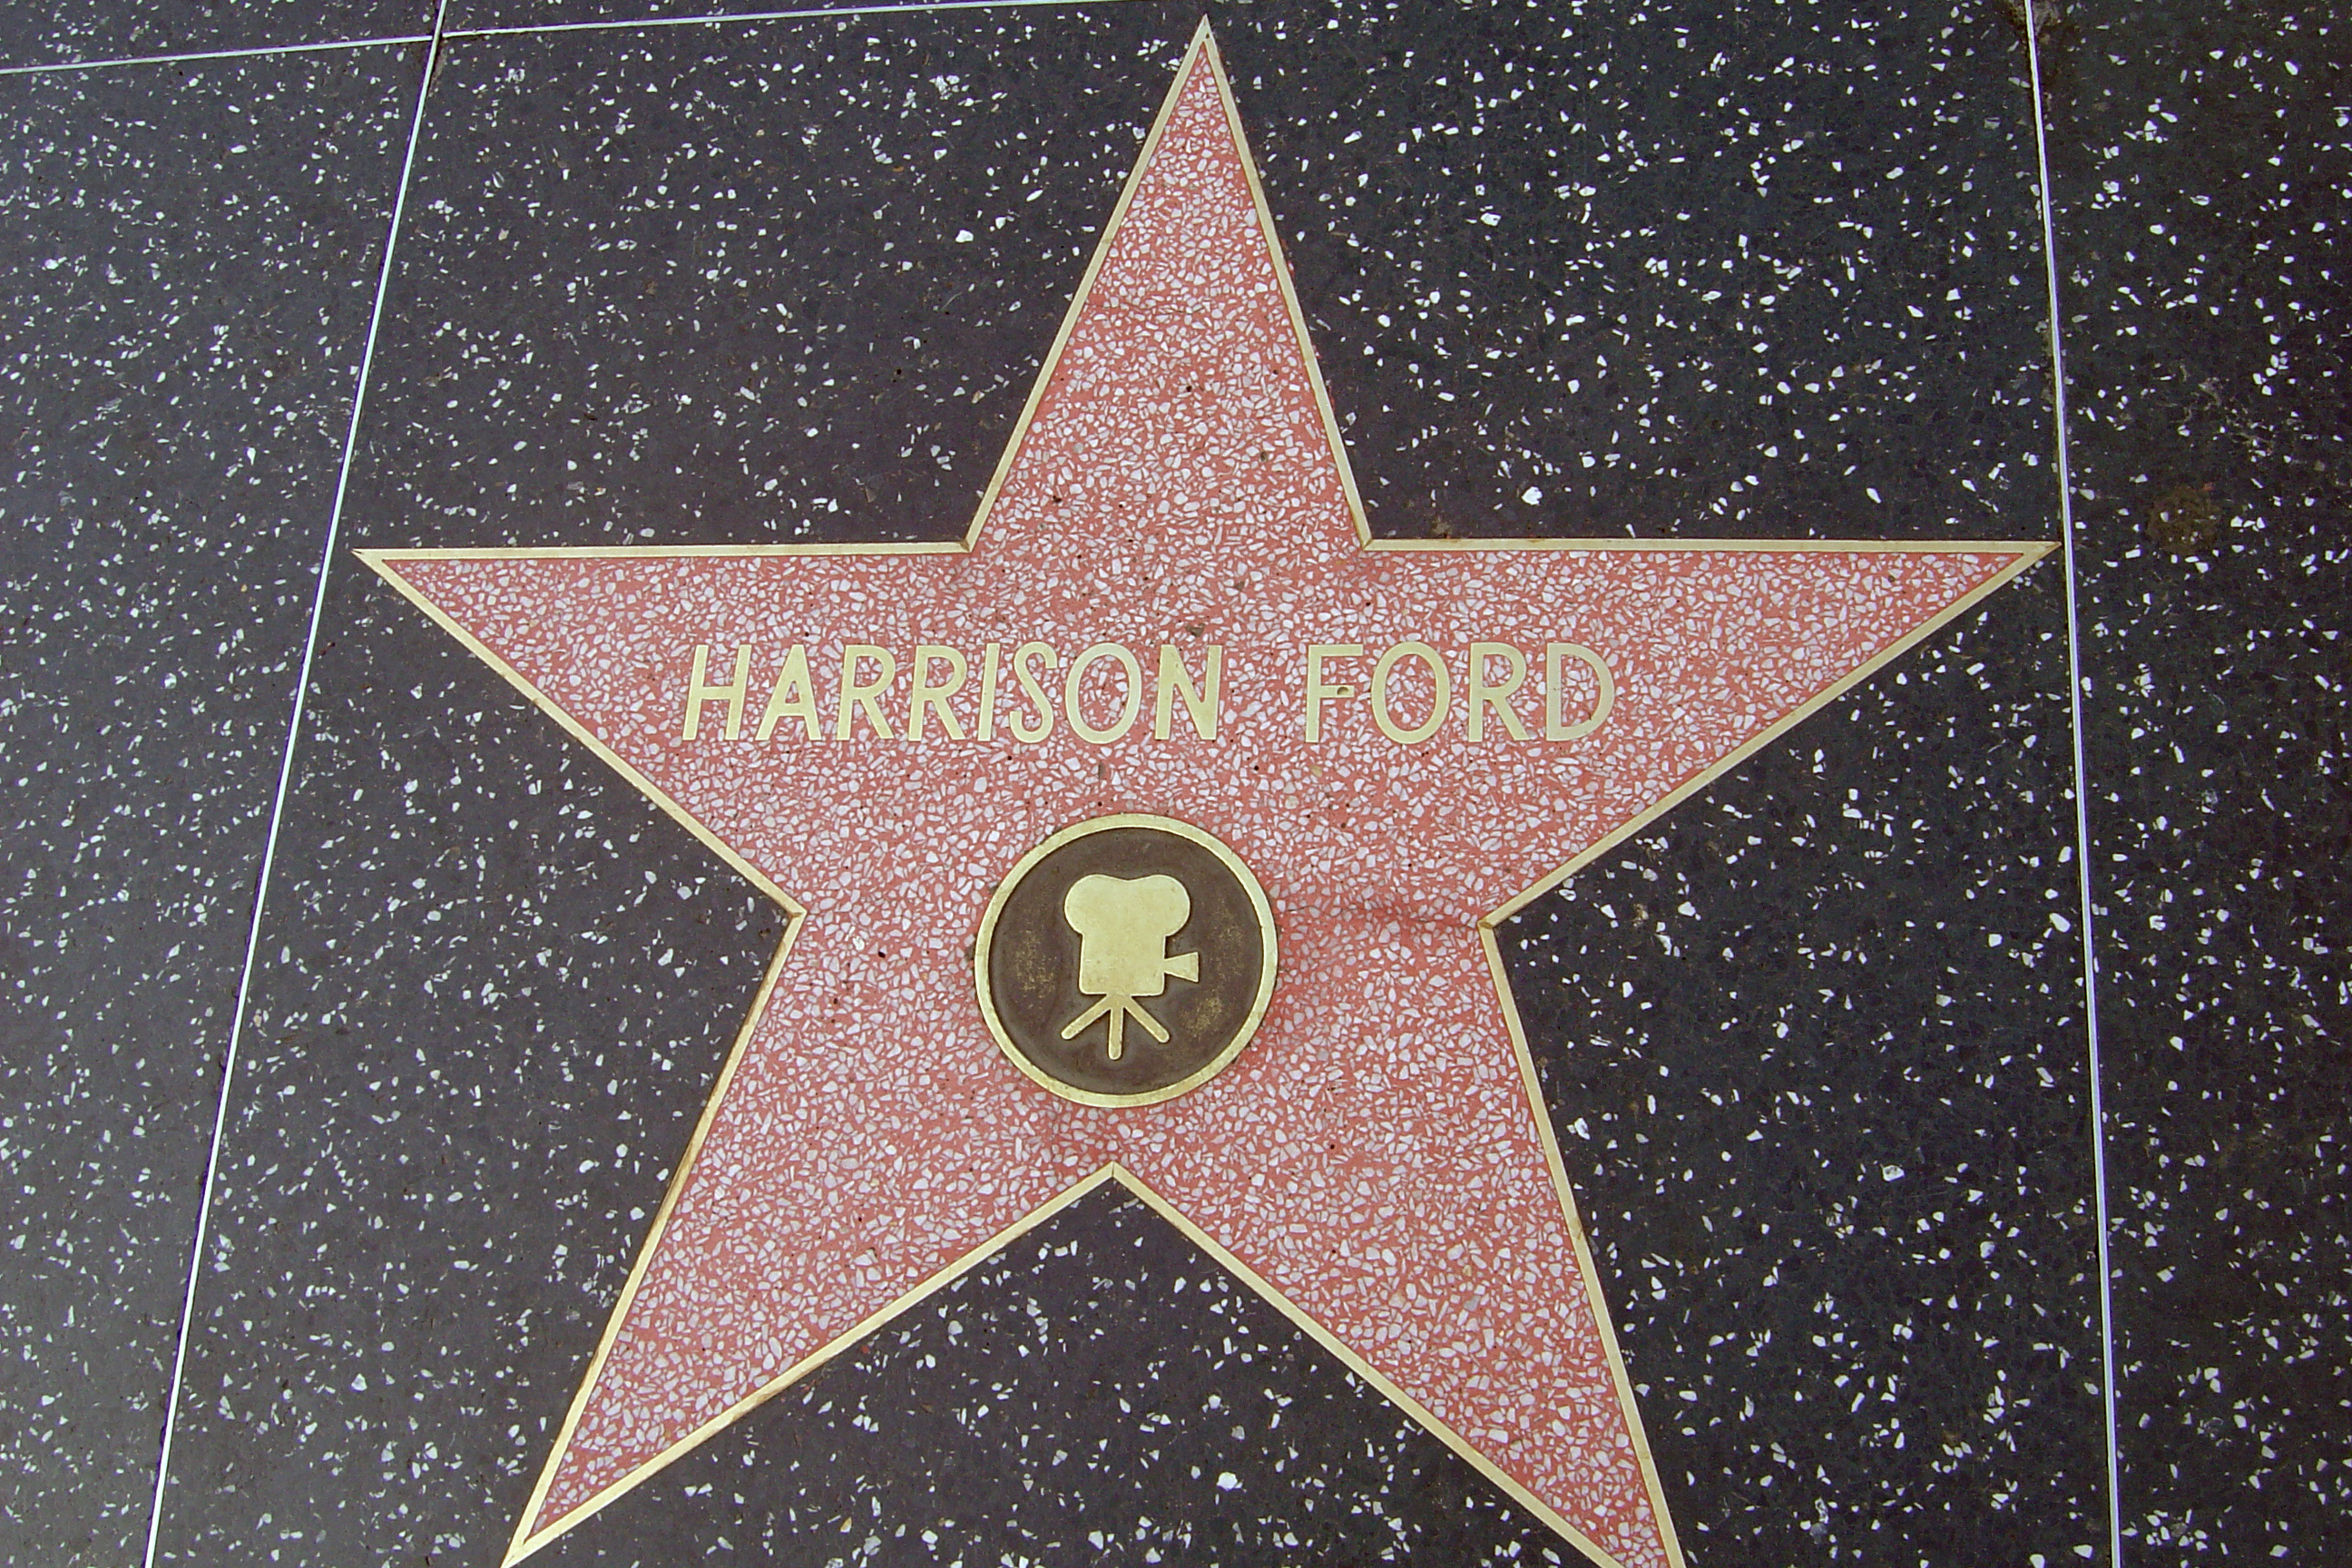 fileharrison fords star on hollywood blvdjpg wikipedia